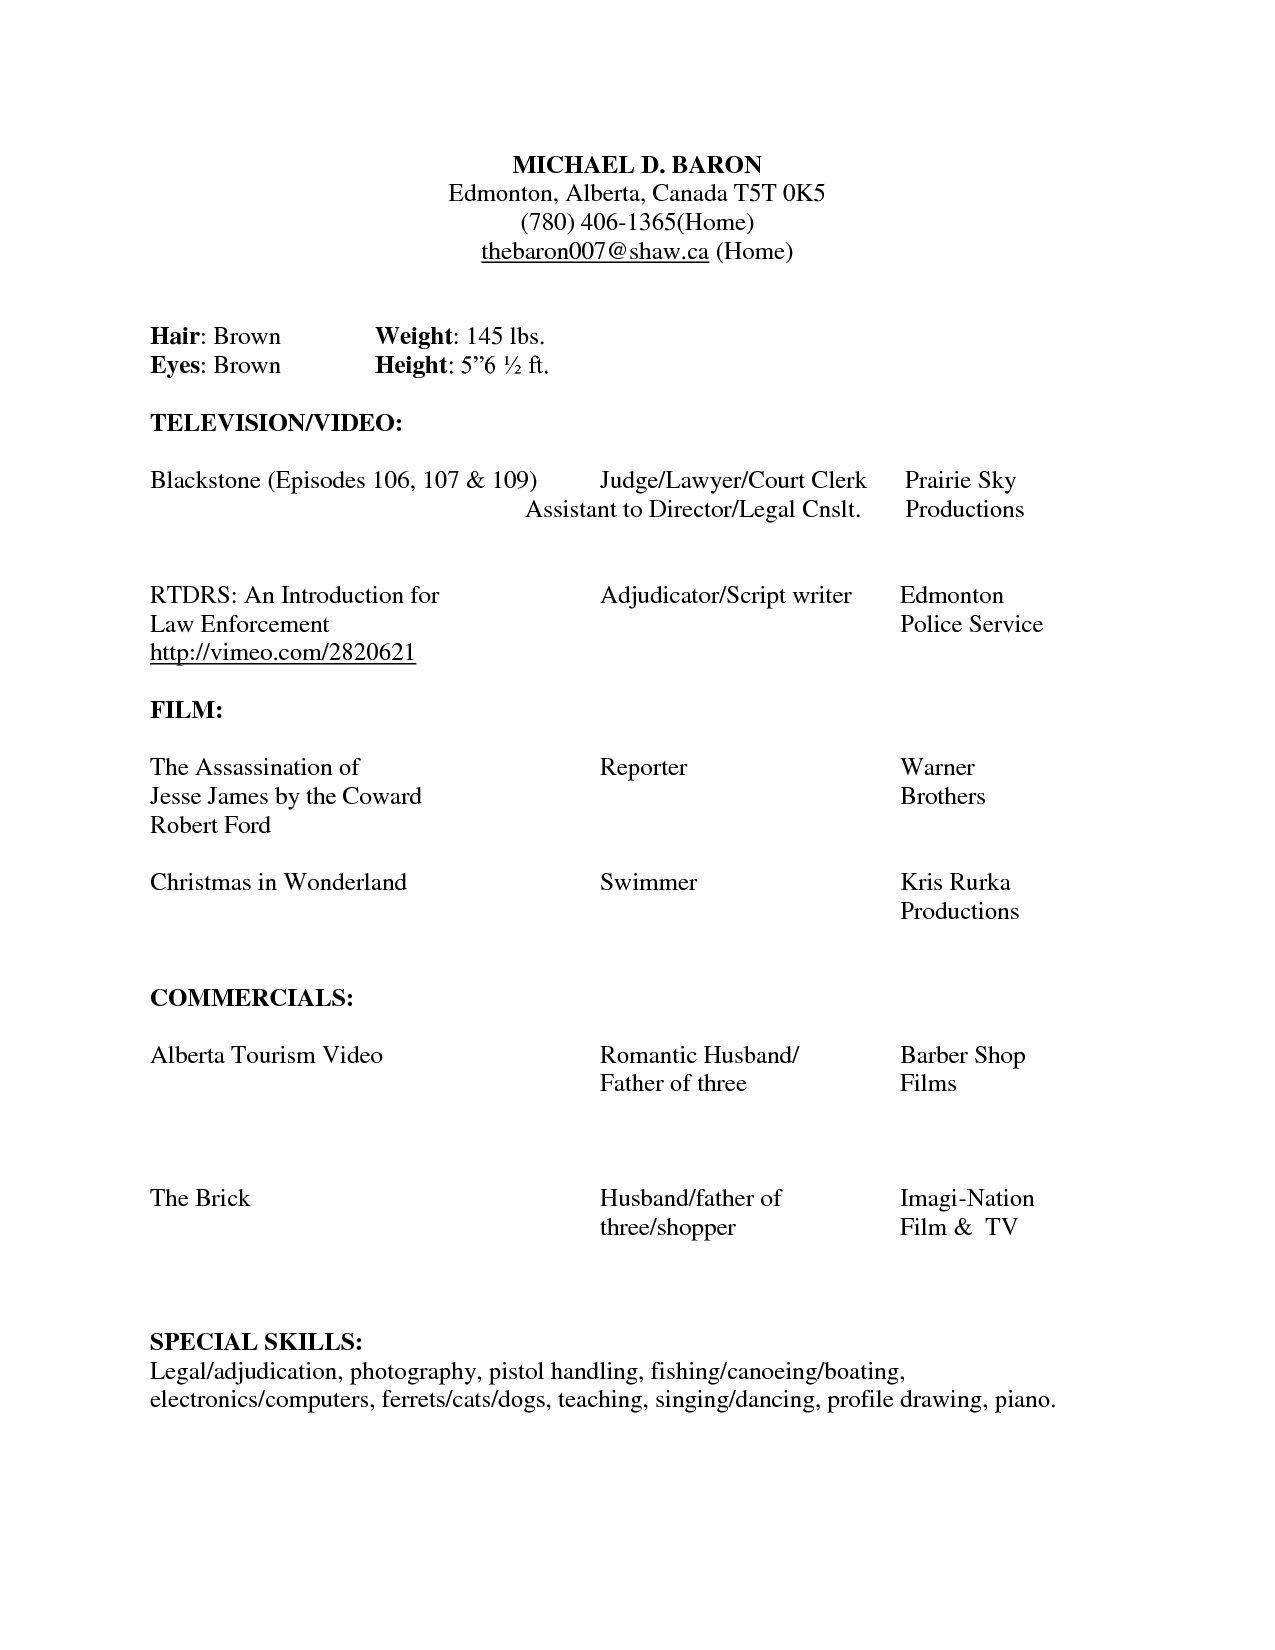 beginner acting resume sample are